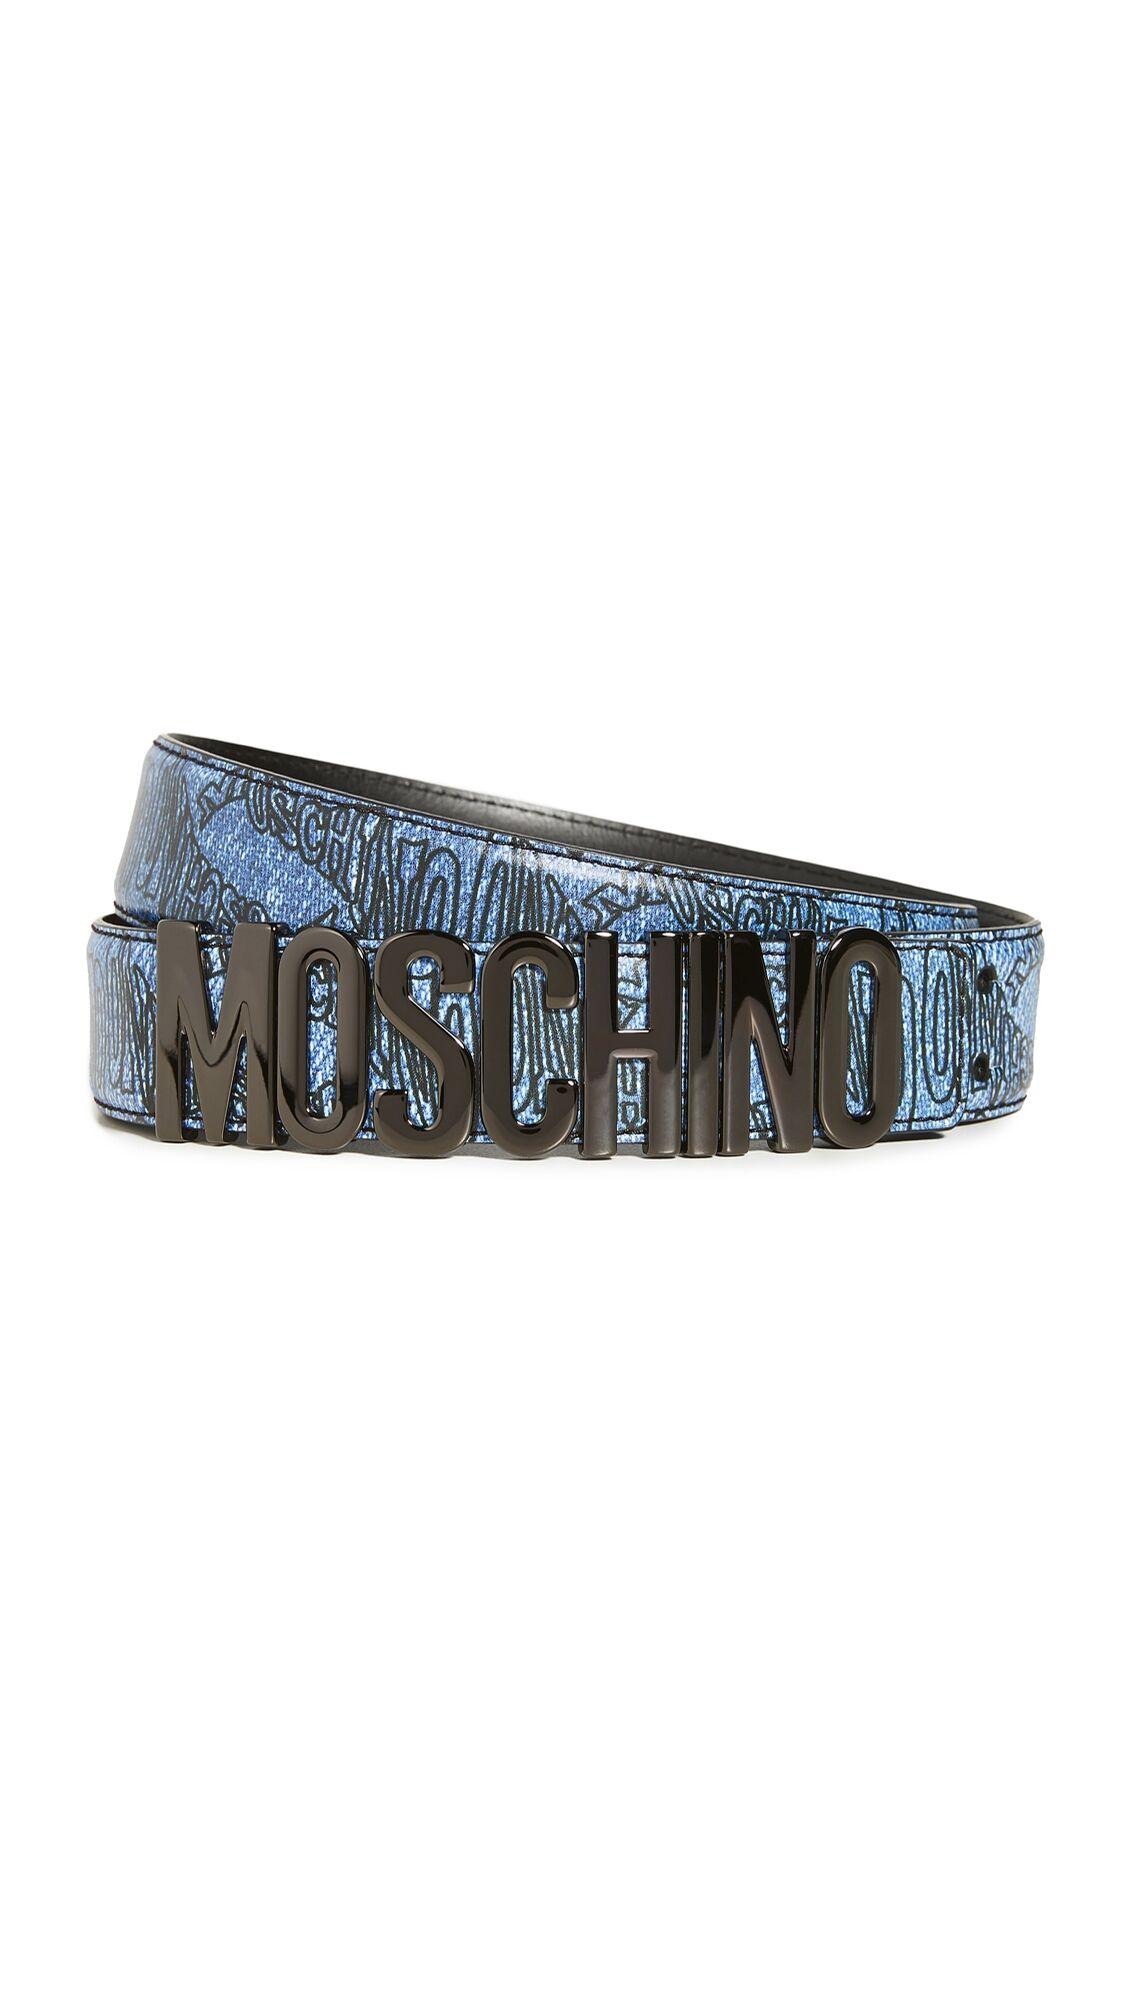 Moschino Leather Logo Belt - Fantasy Print Blue - Size: 52